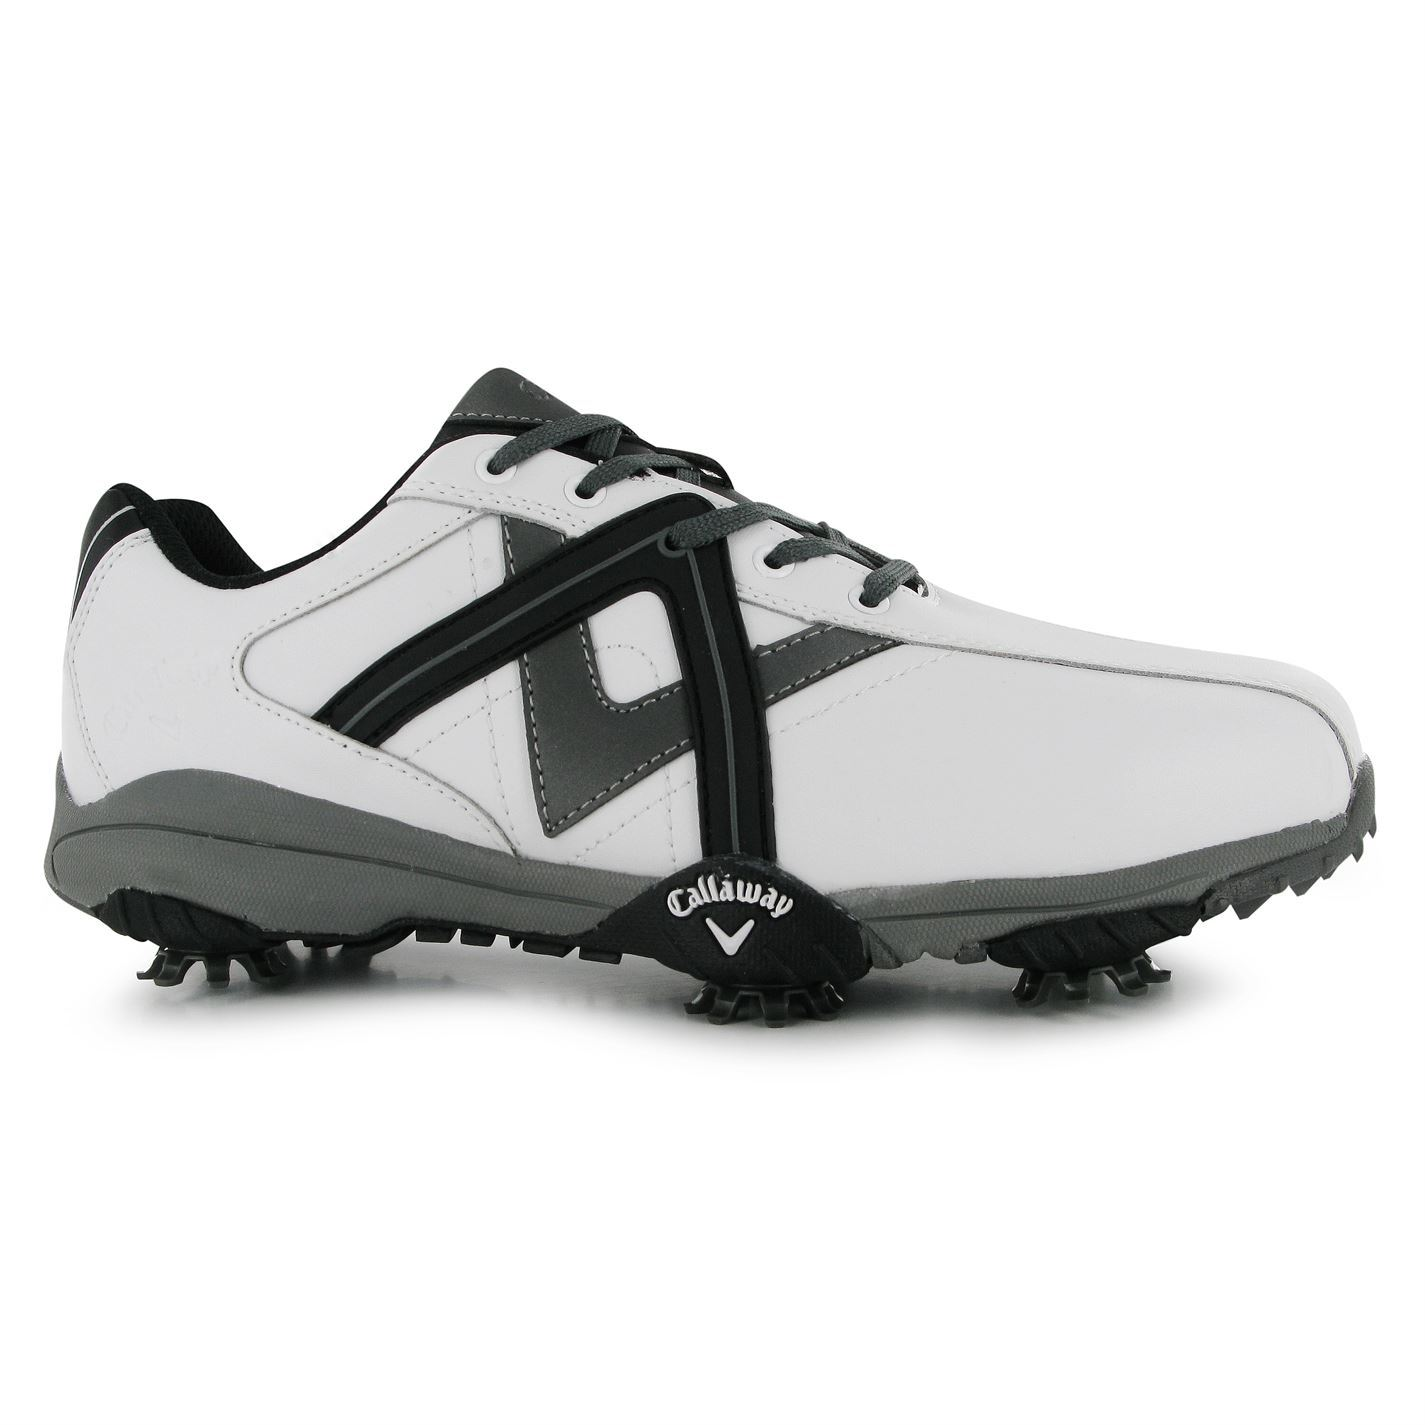 Callaway-Cheviot-ll-Golf-Shoes-Mens-Spikes-Footwear thumbnail 14